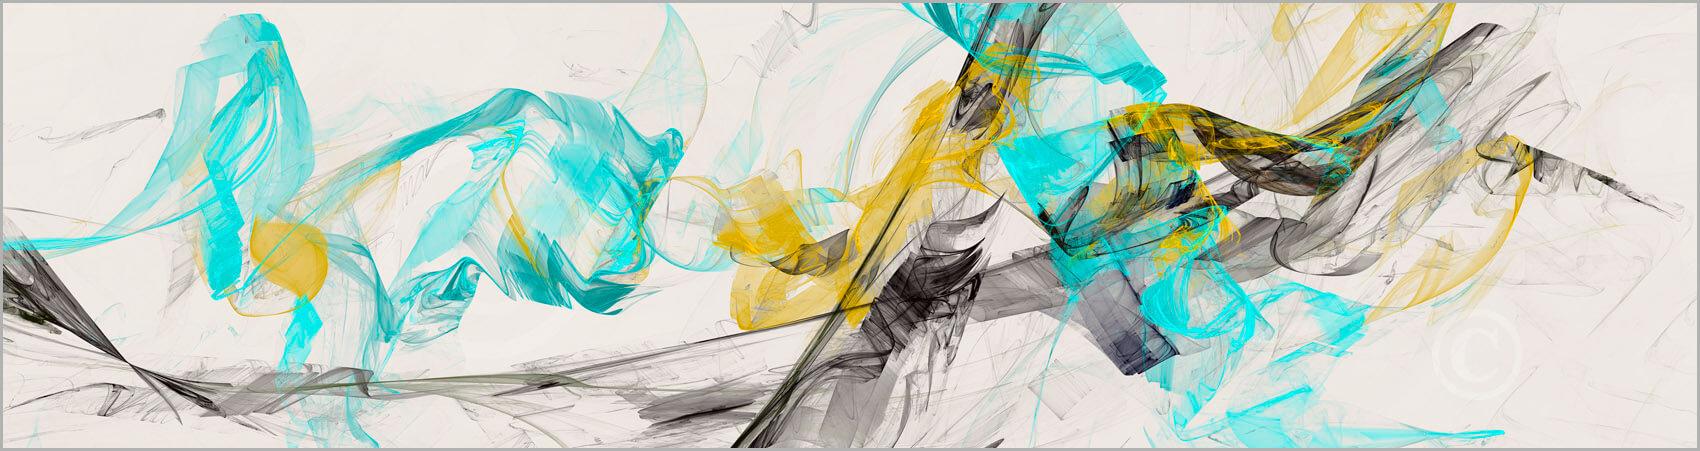 Colortrails_F2_7015_XXXL